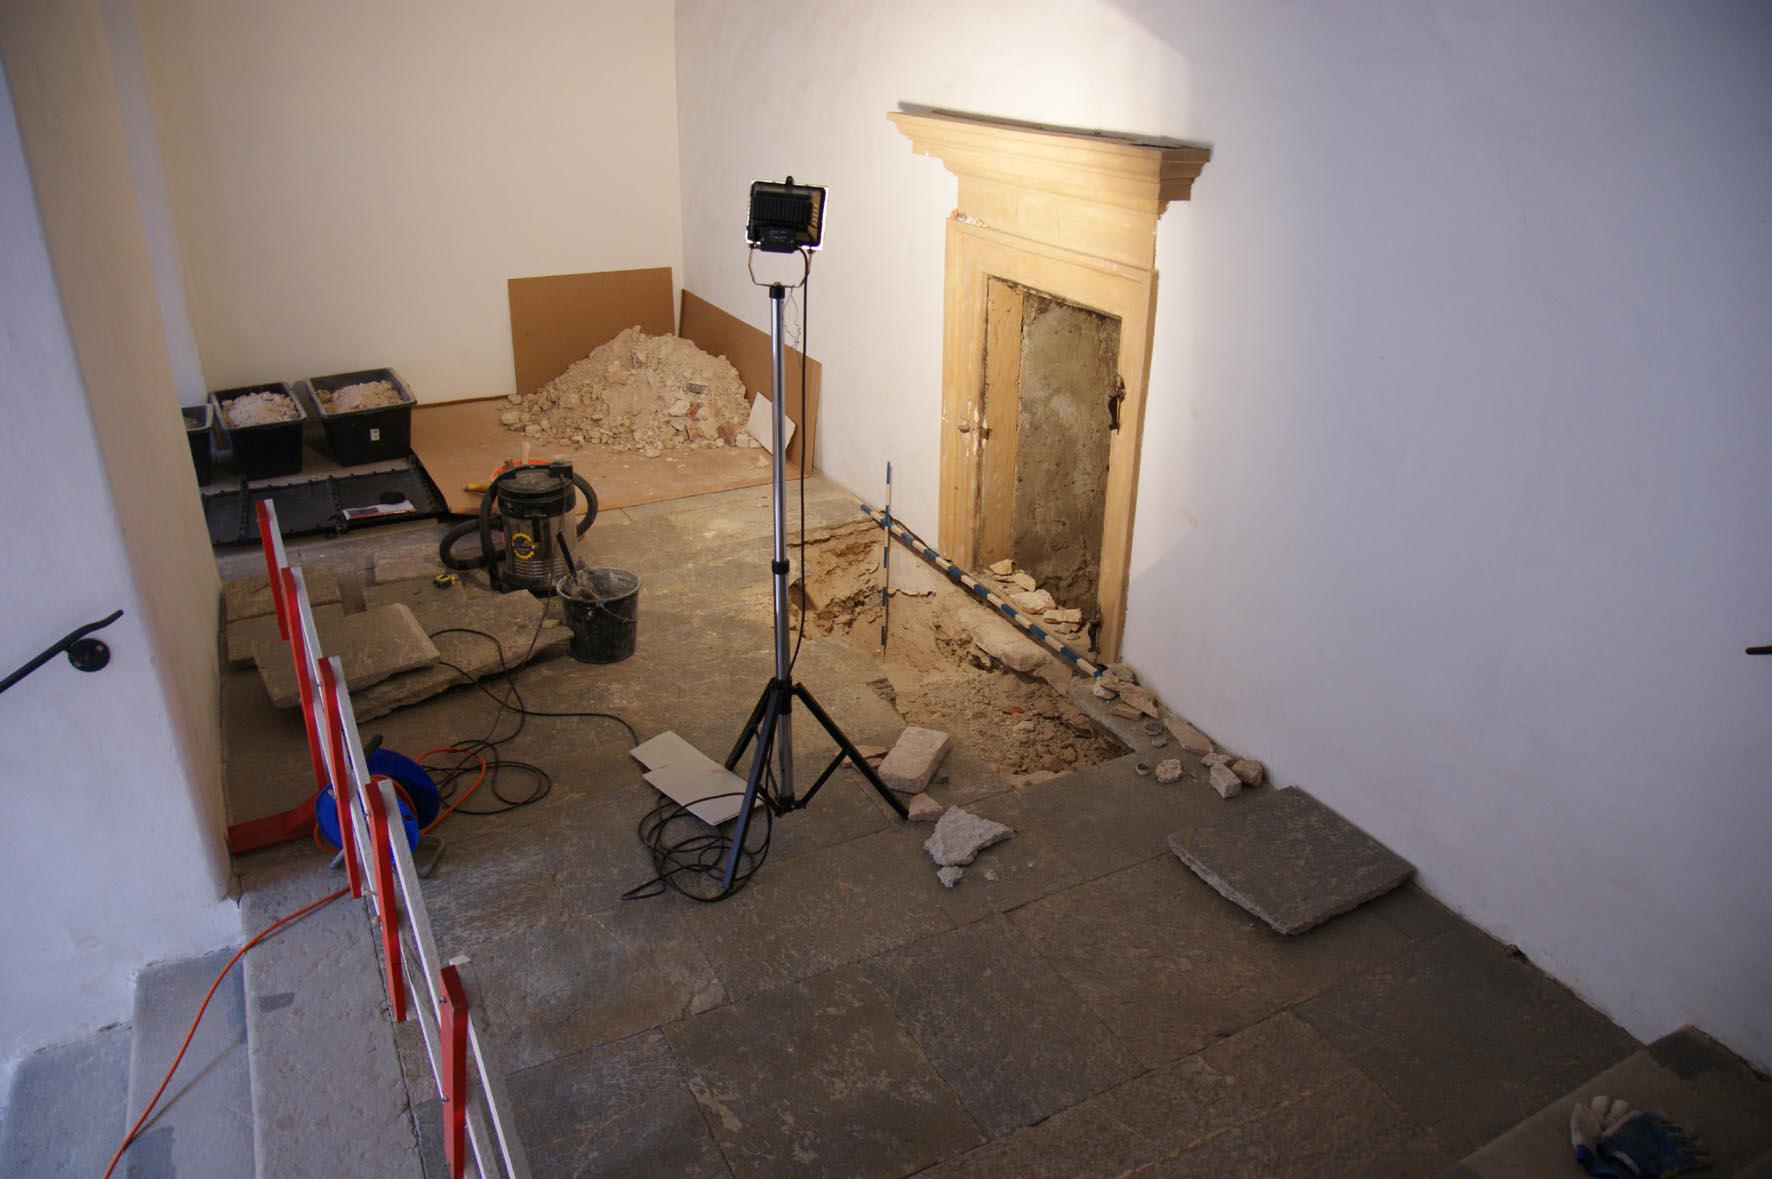 Stiegenhausforschung, Foto: UMJ